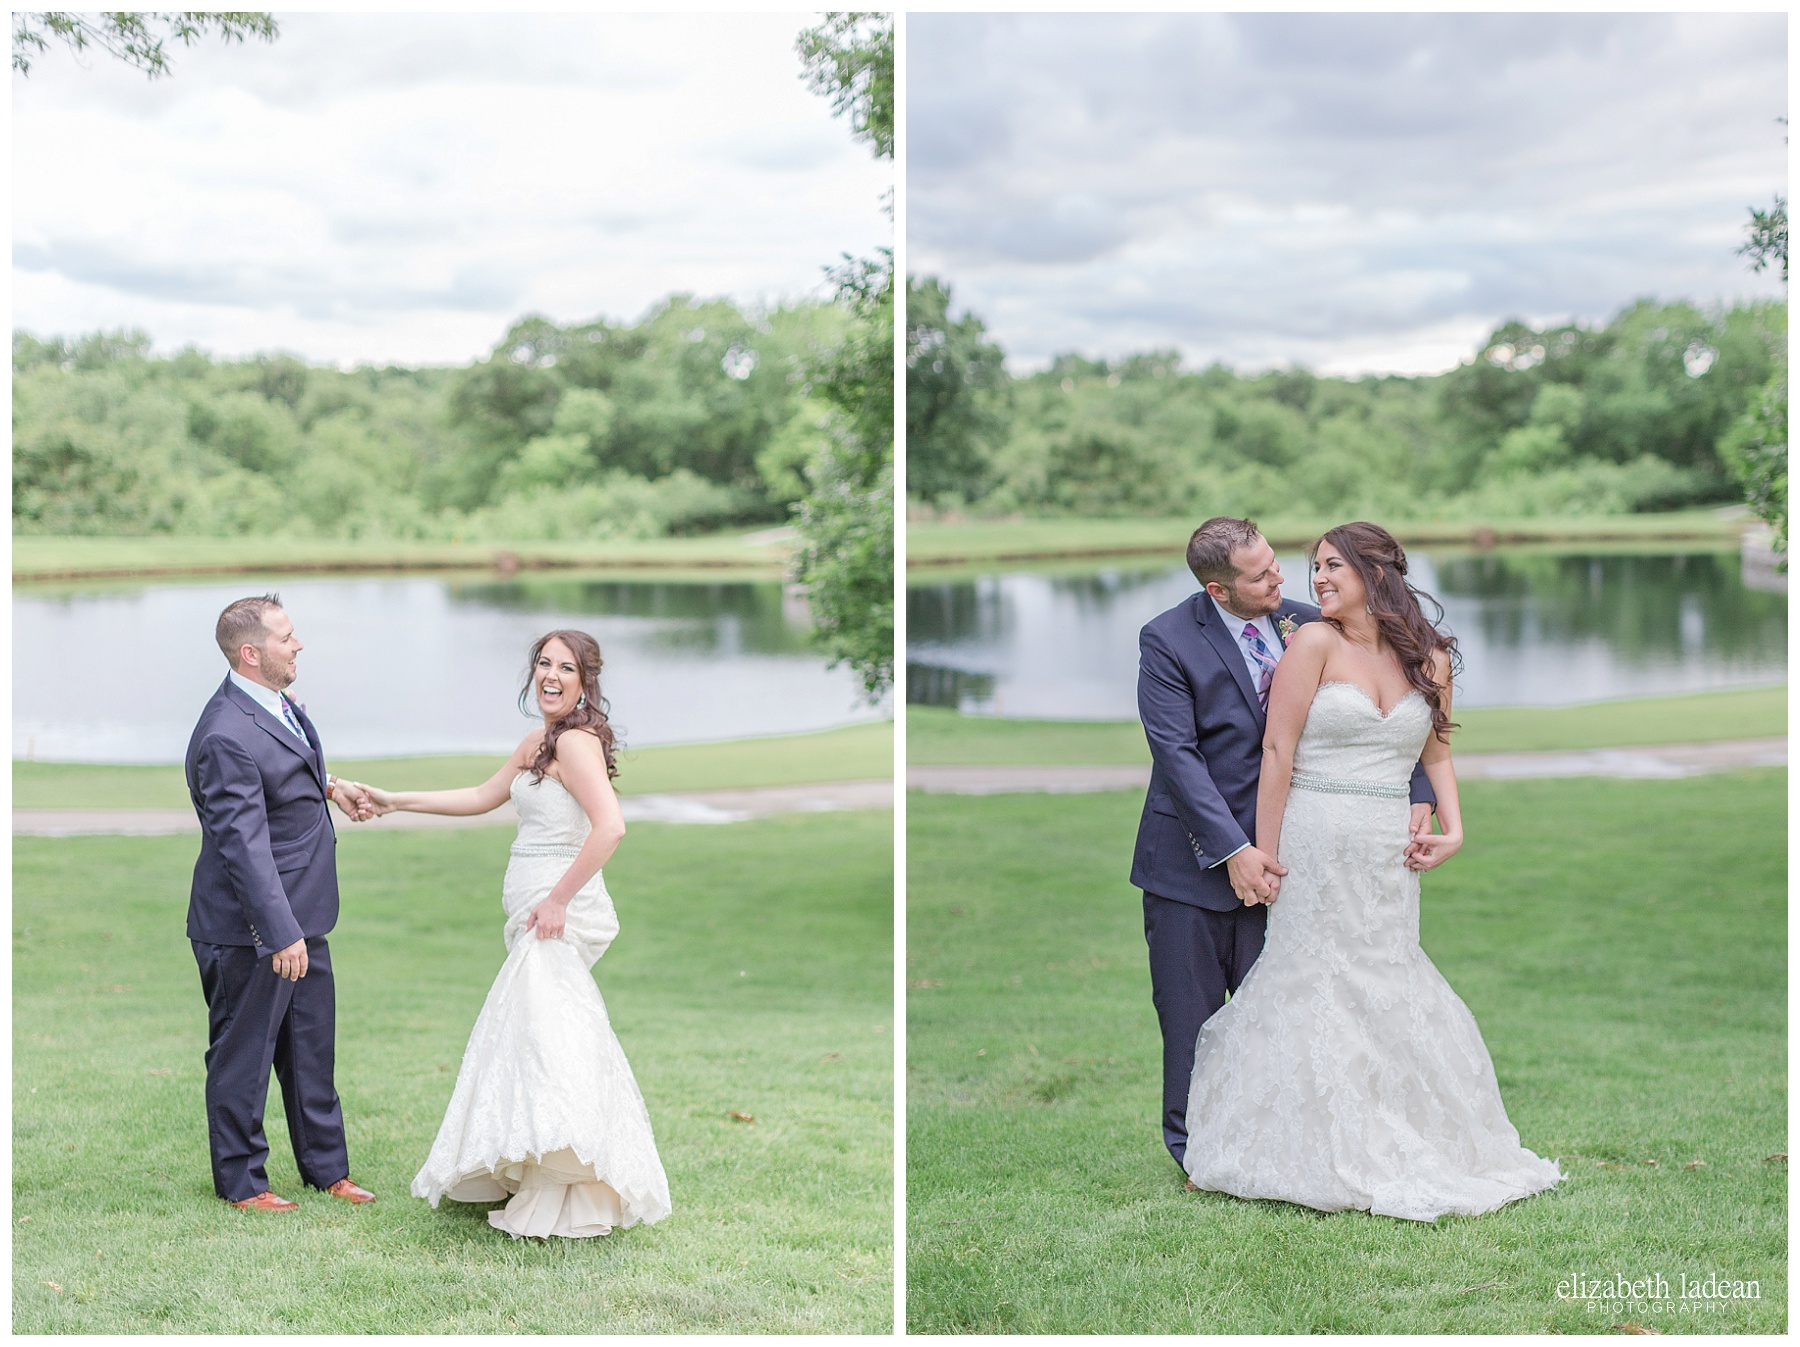 Hillcrest-Country-Club-Kansas-City-Wedding-Photography-E+J-0520-Elizabeth-Ladean-Photography-photo_0866.jpg